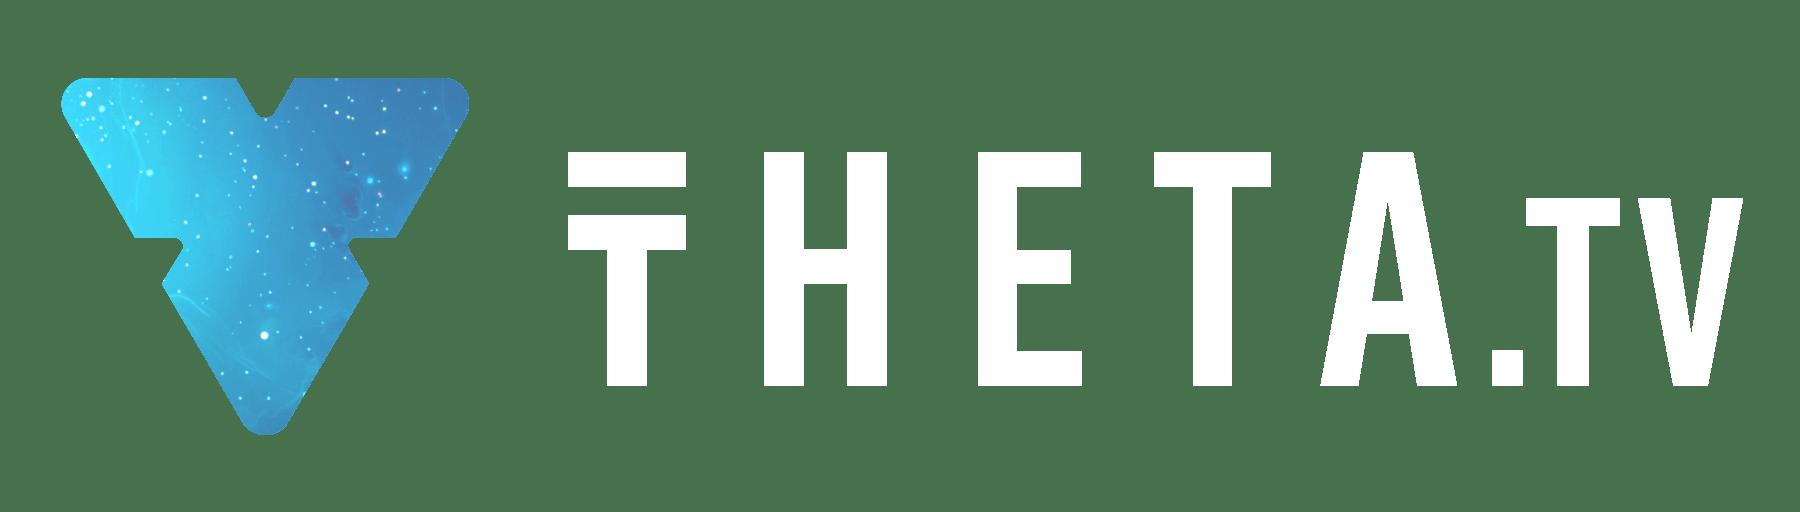 THETA.tv